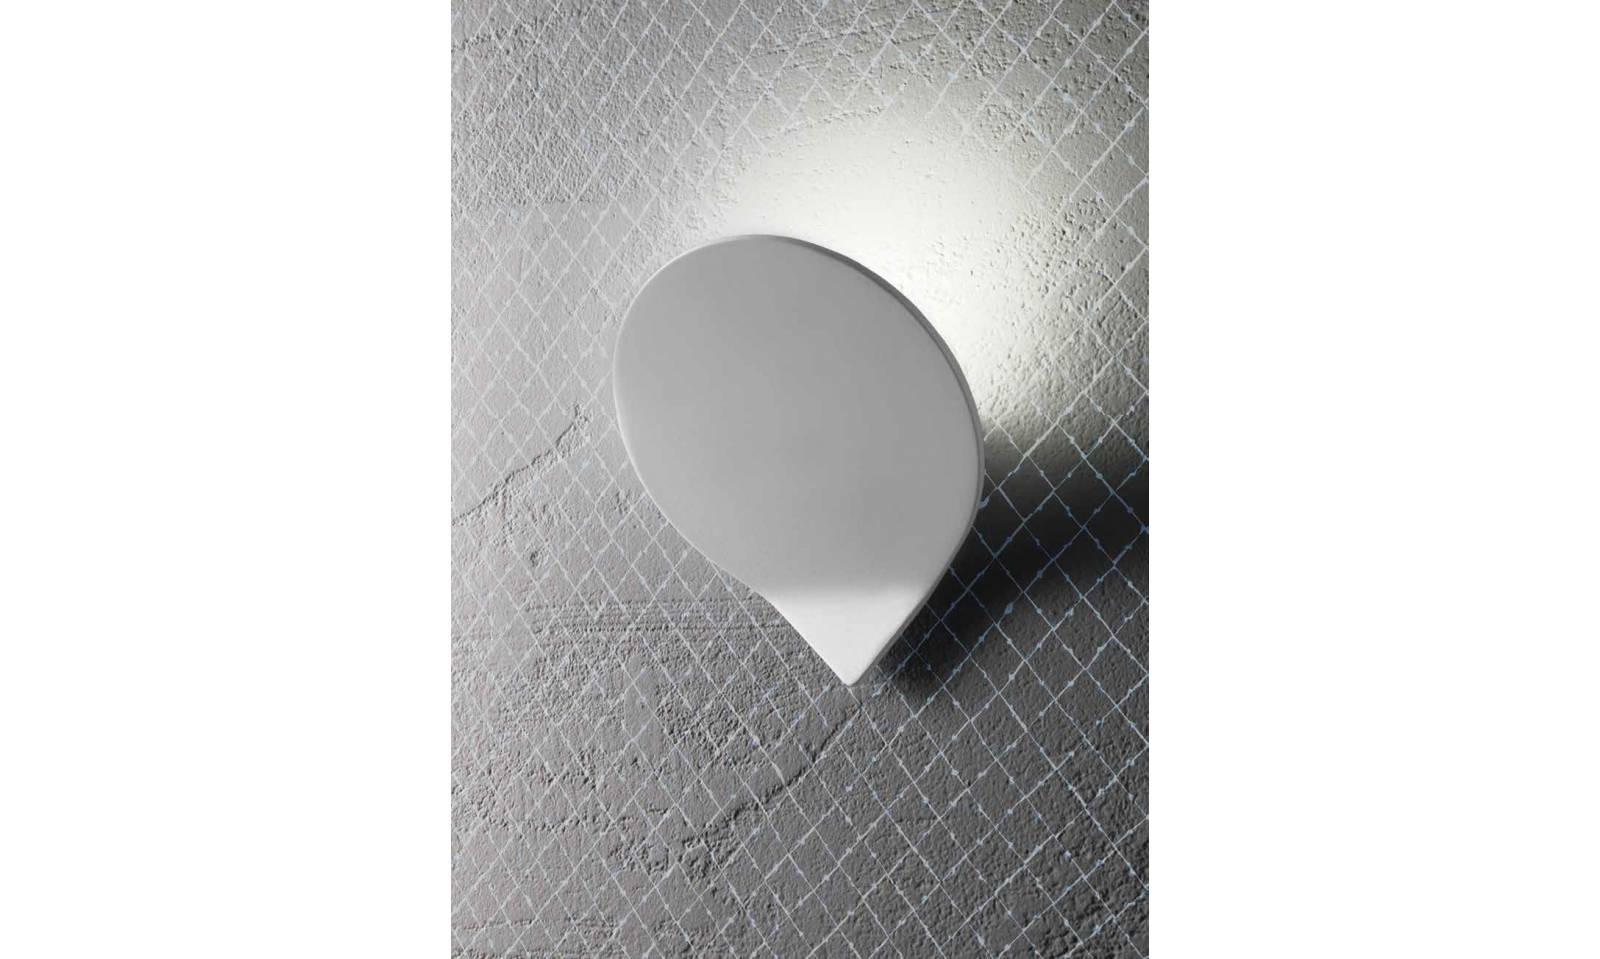 ciciriello applique zenith led arteluce. Black Bedroom Furniture Sets. Home Design Ideas